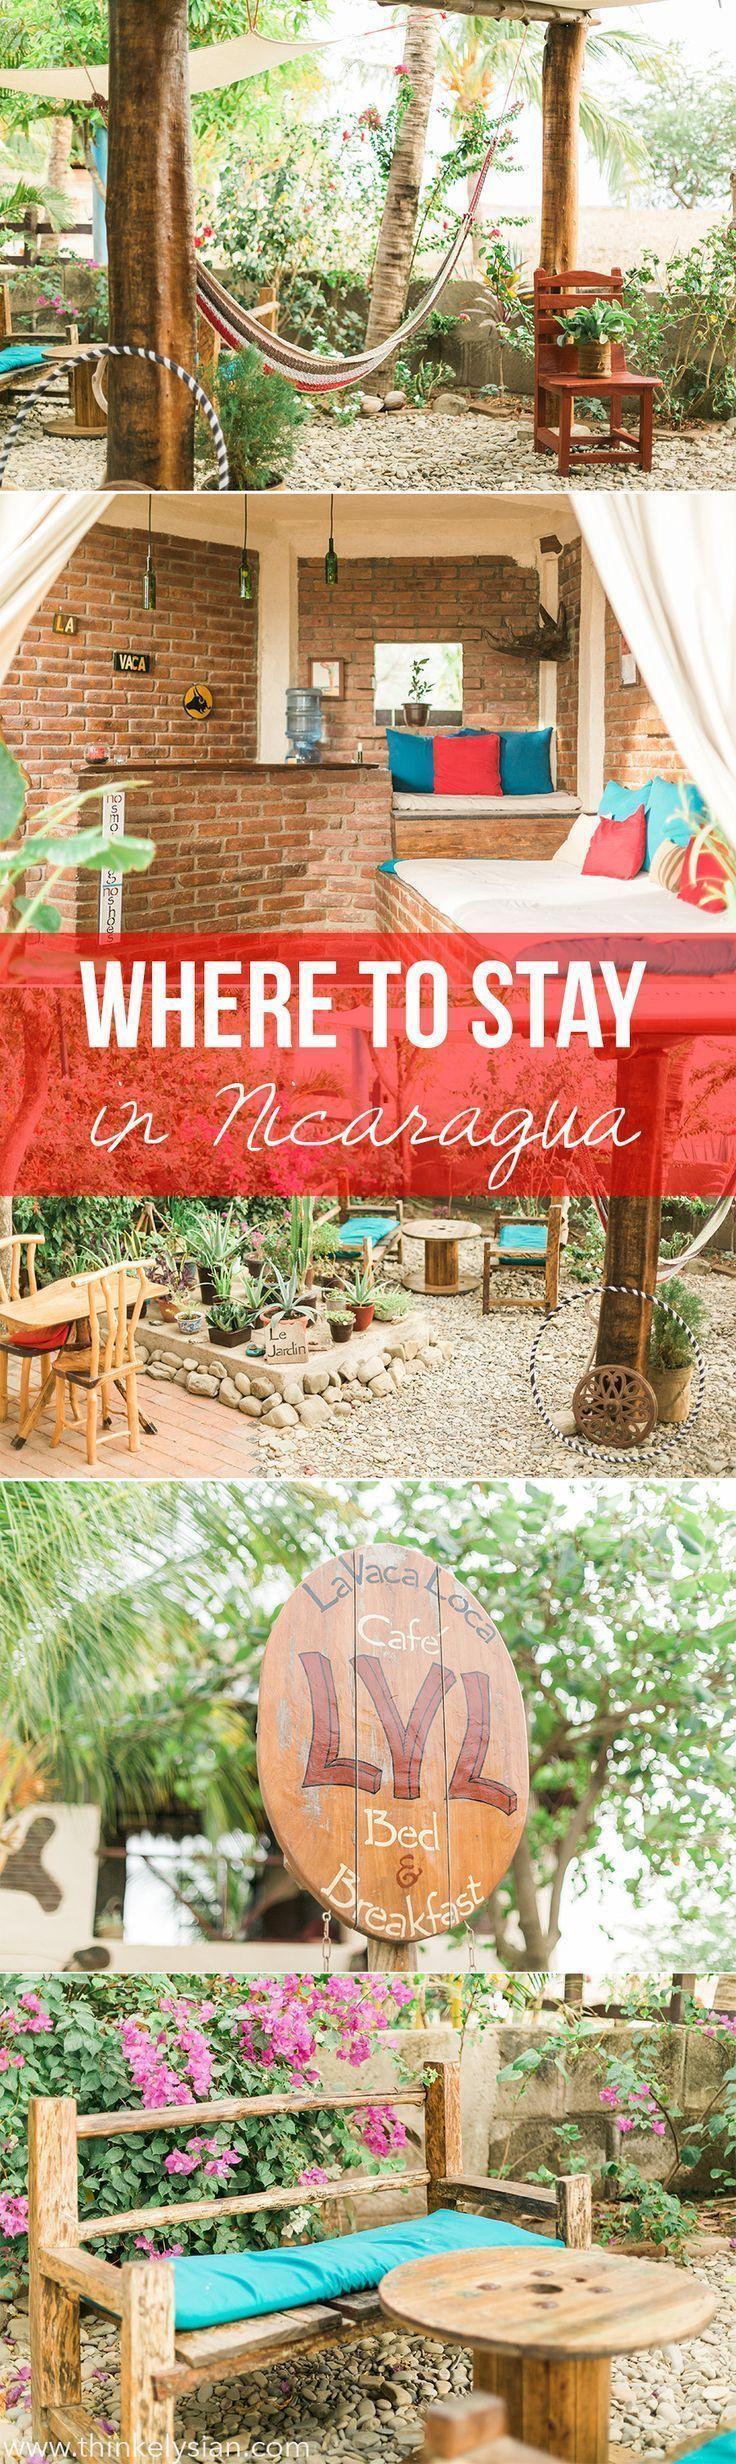 Where to stay in Nicaragua - Our favorite B&B near Popoyo Beach #Travel #Voyage #Nicaragua #BedandBreakfast #PopoyoBeach #Beach #Surf #Stay #Guide #Information